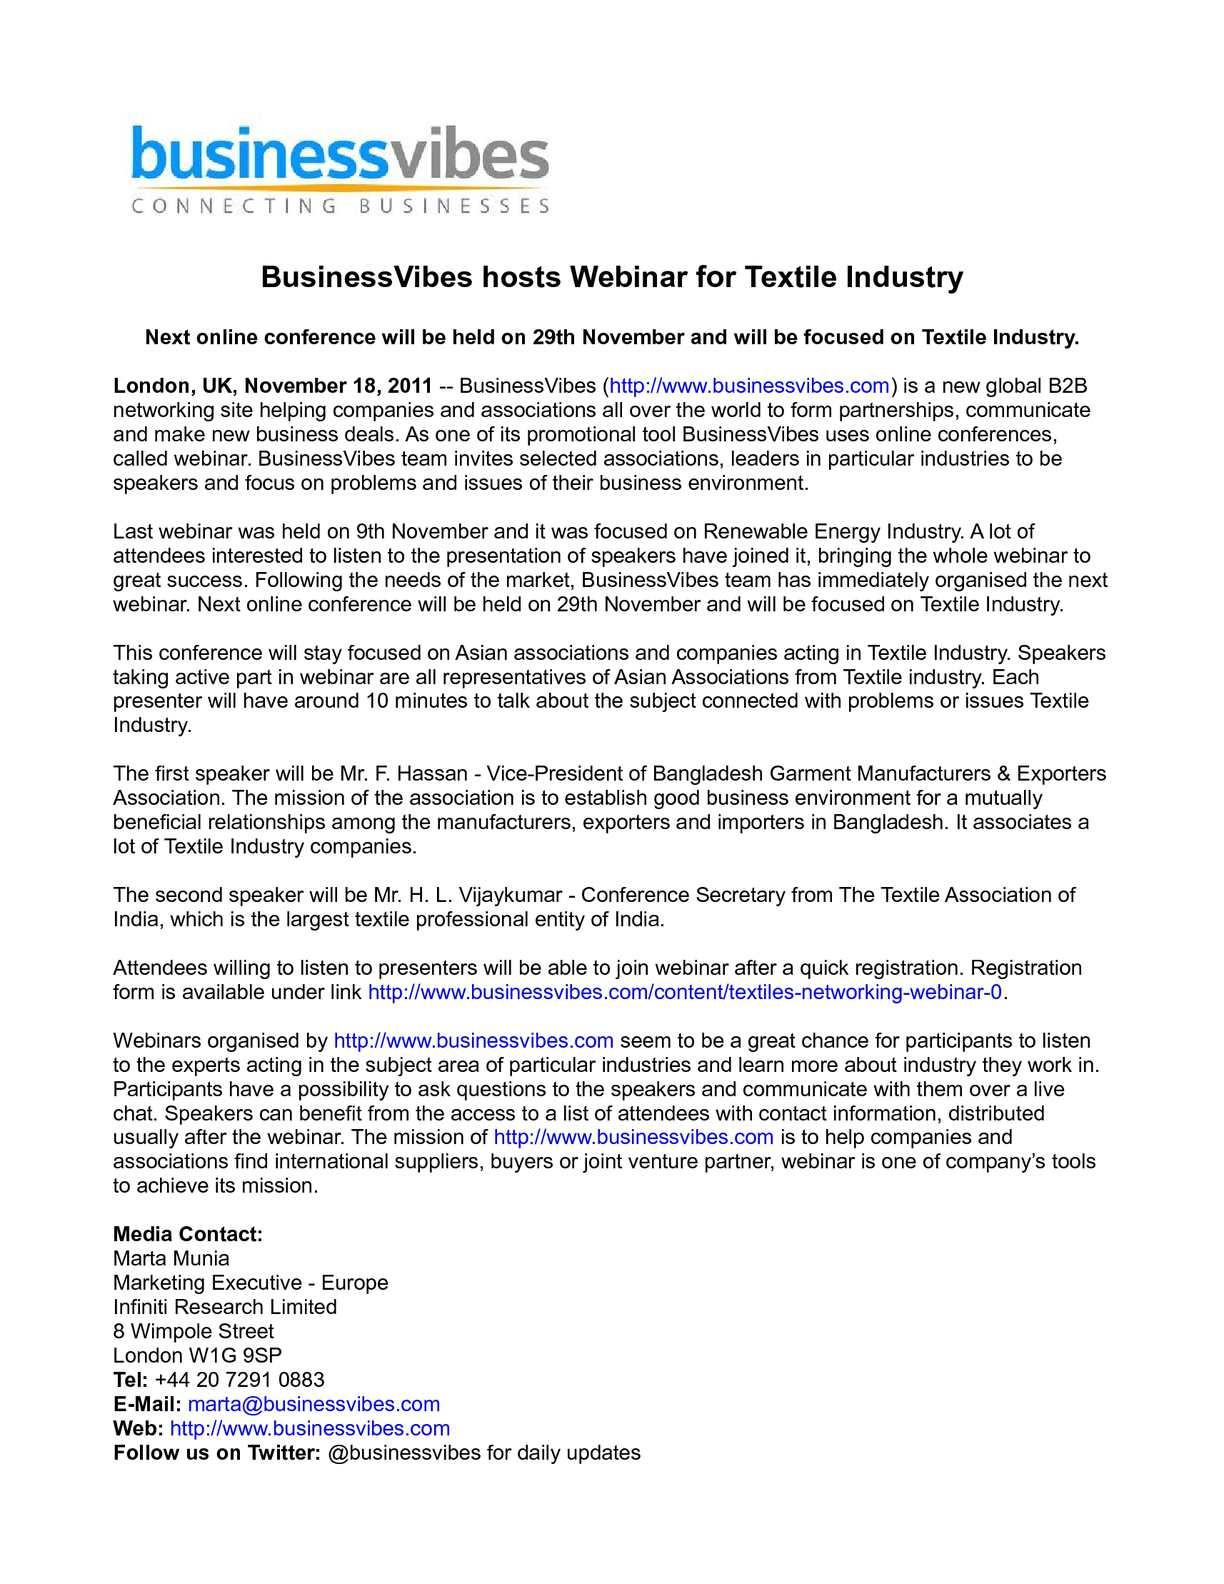 Calaméo - BusinessVibes hosts Webinar for Textile Industry